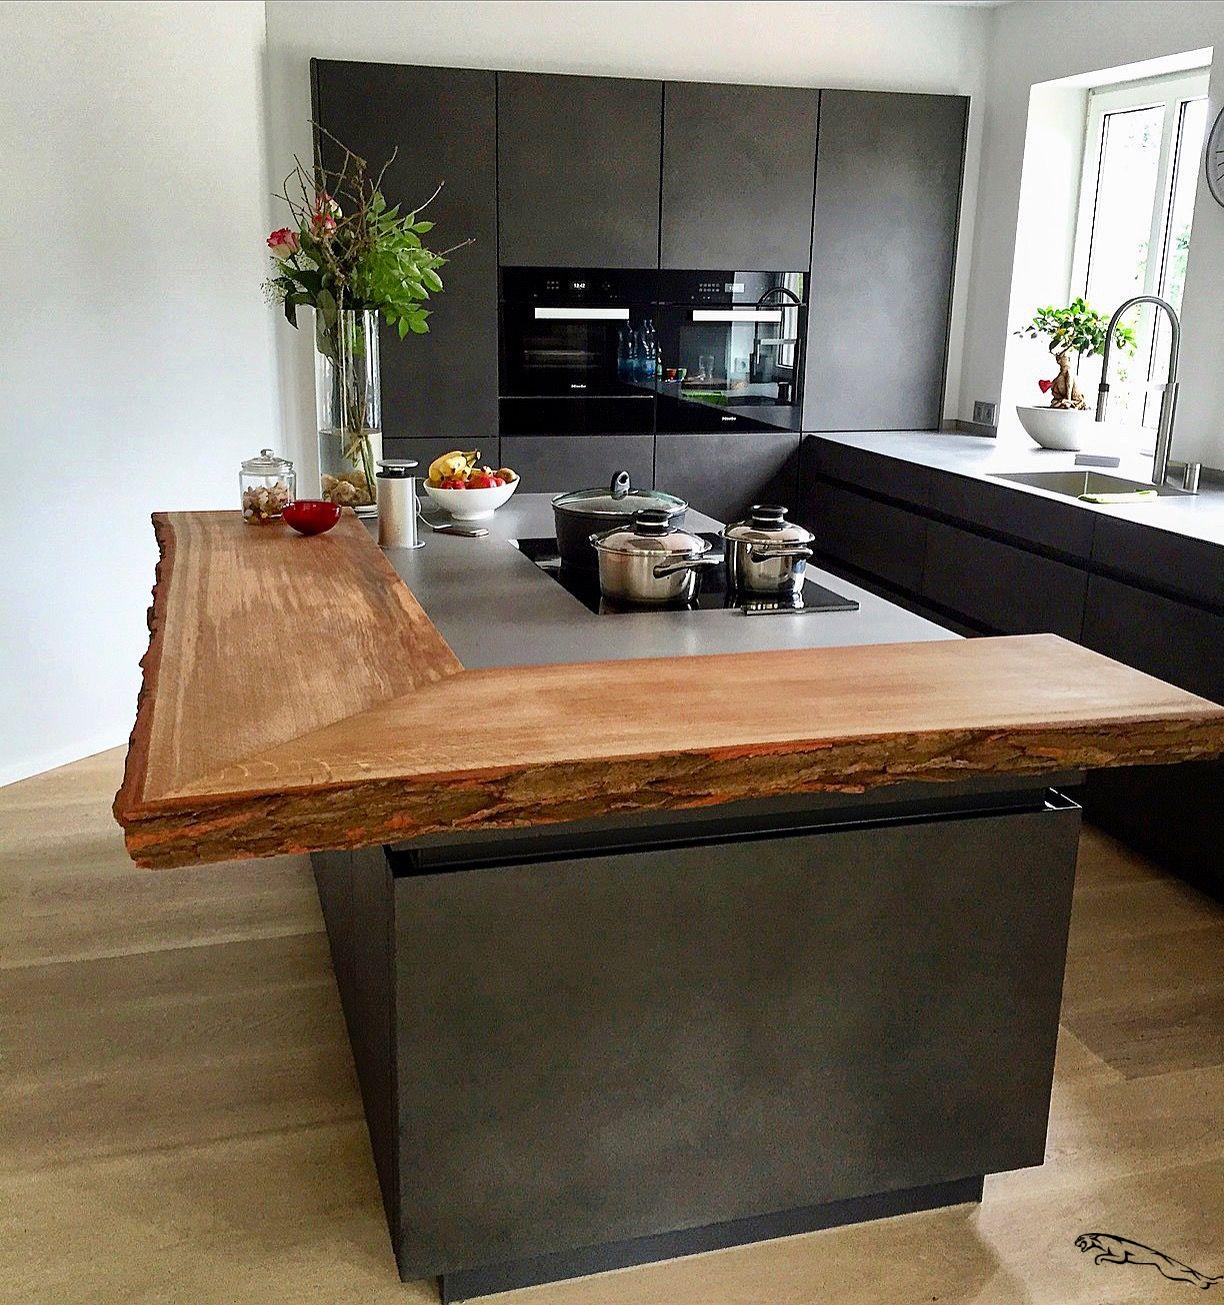 Photo of Bancone cucina bancone cucina bancone bar in legno #kucheideen